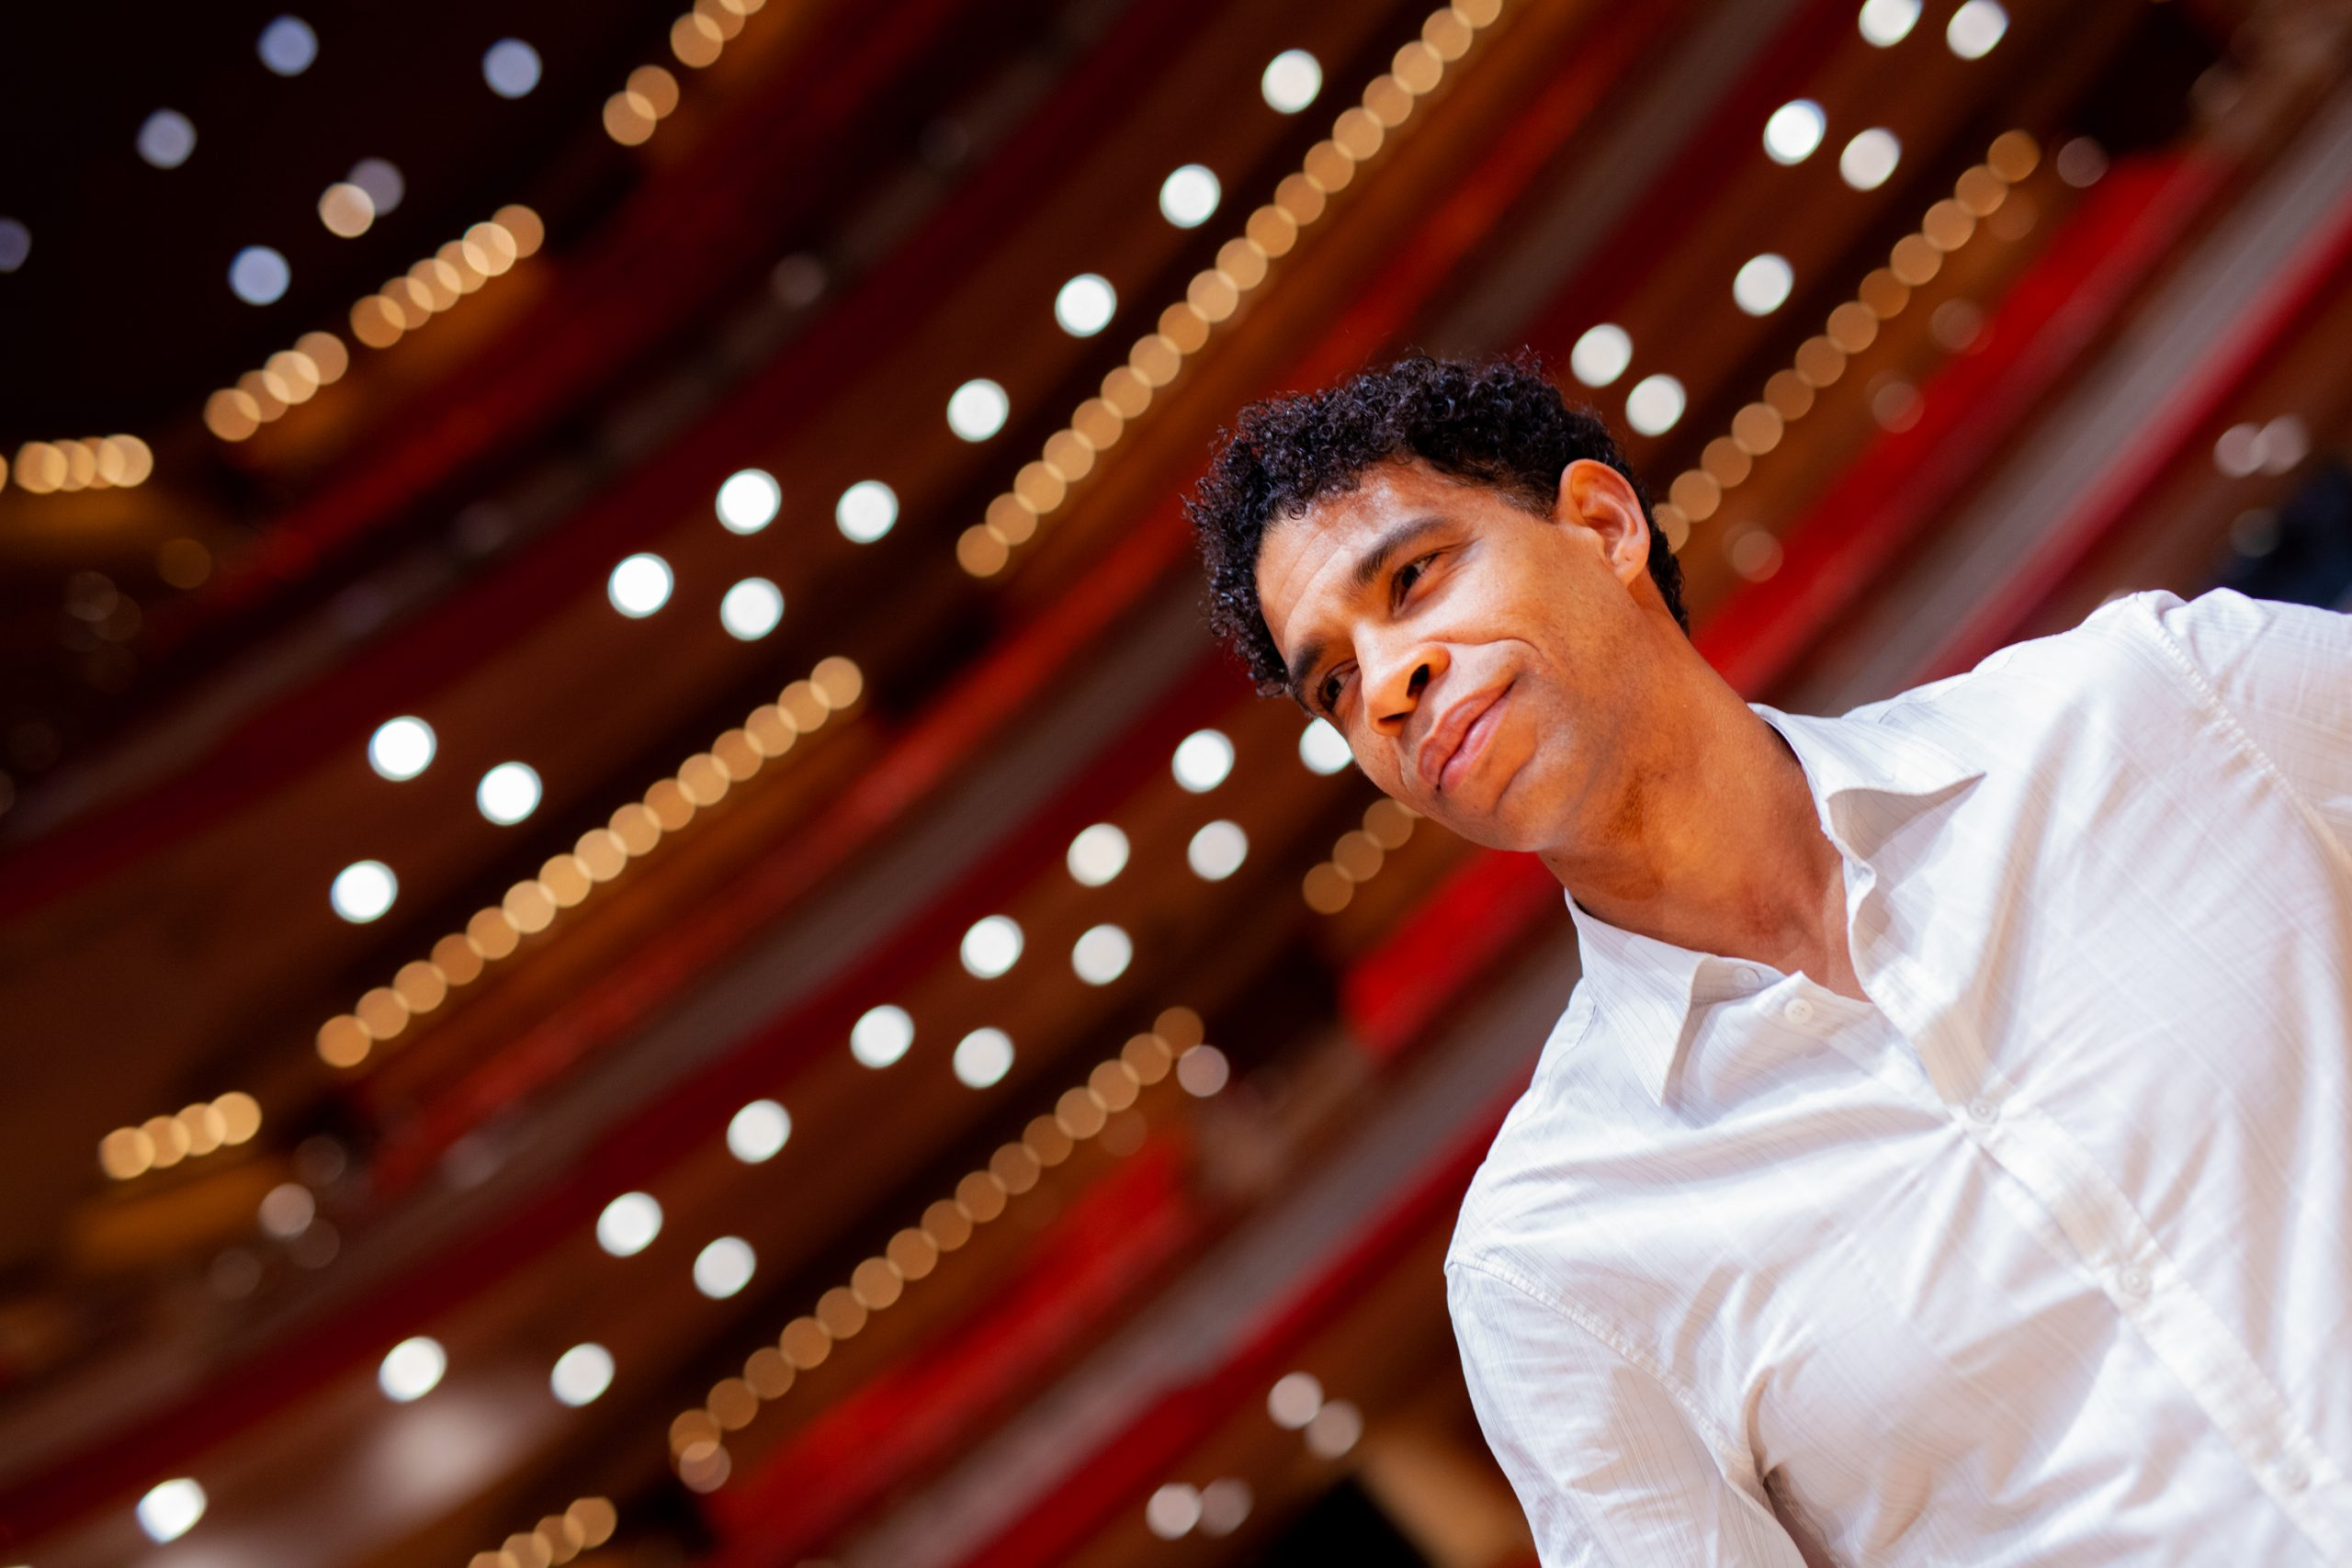 Carlos Acosta at Birmingham Royal Ballet © Man Yee Lee